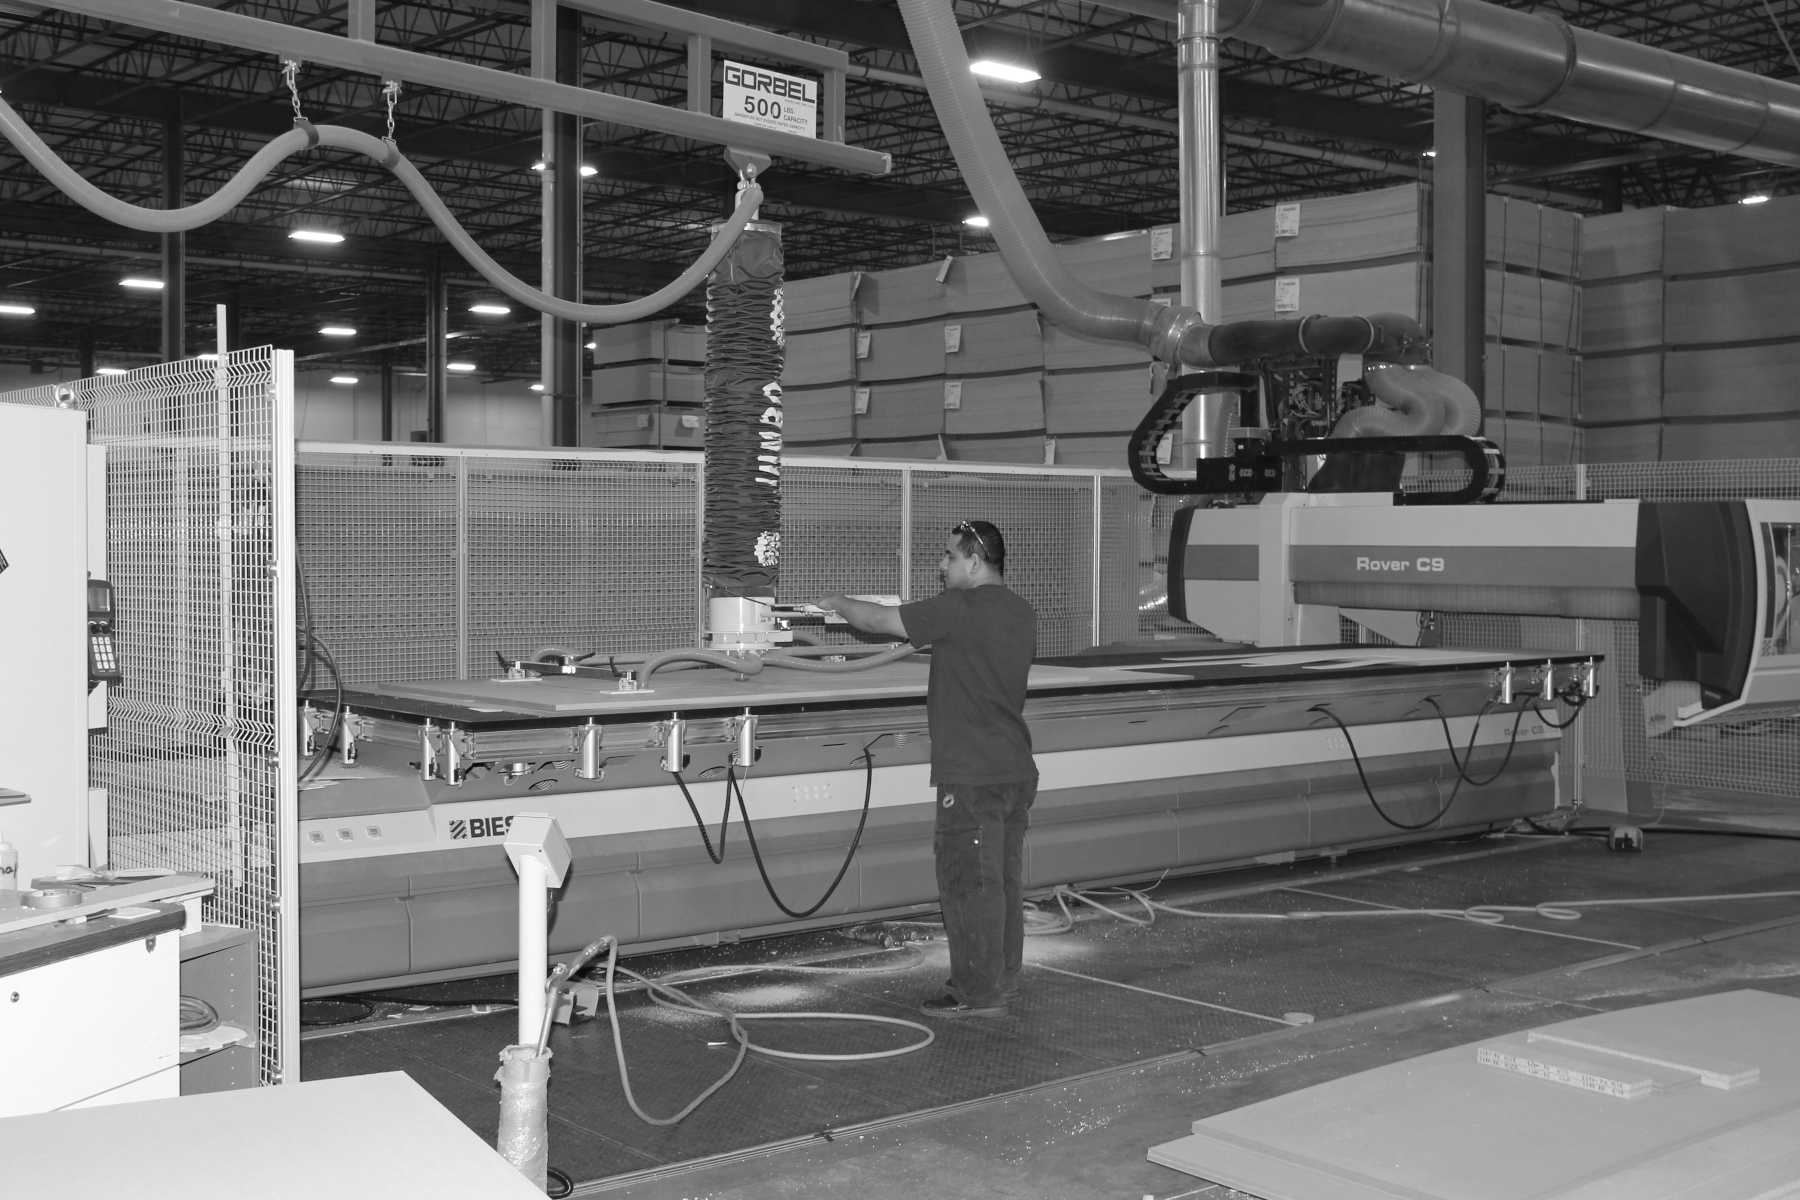 https://mw-sf.com/wp-content/uploads/2019/11/wood-manufacturing-09.jpg